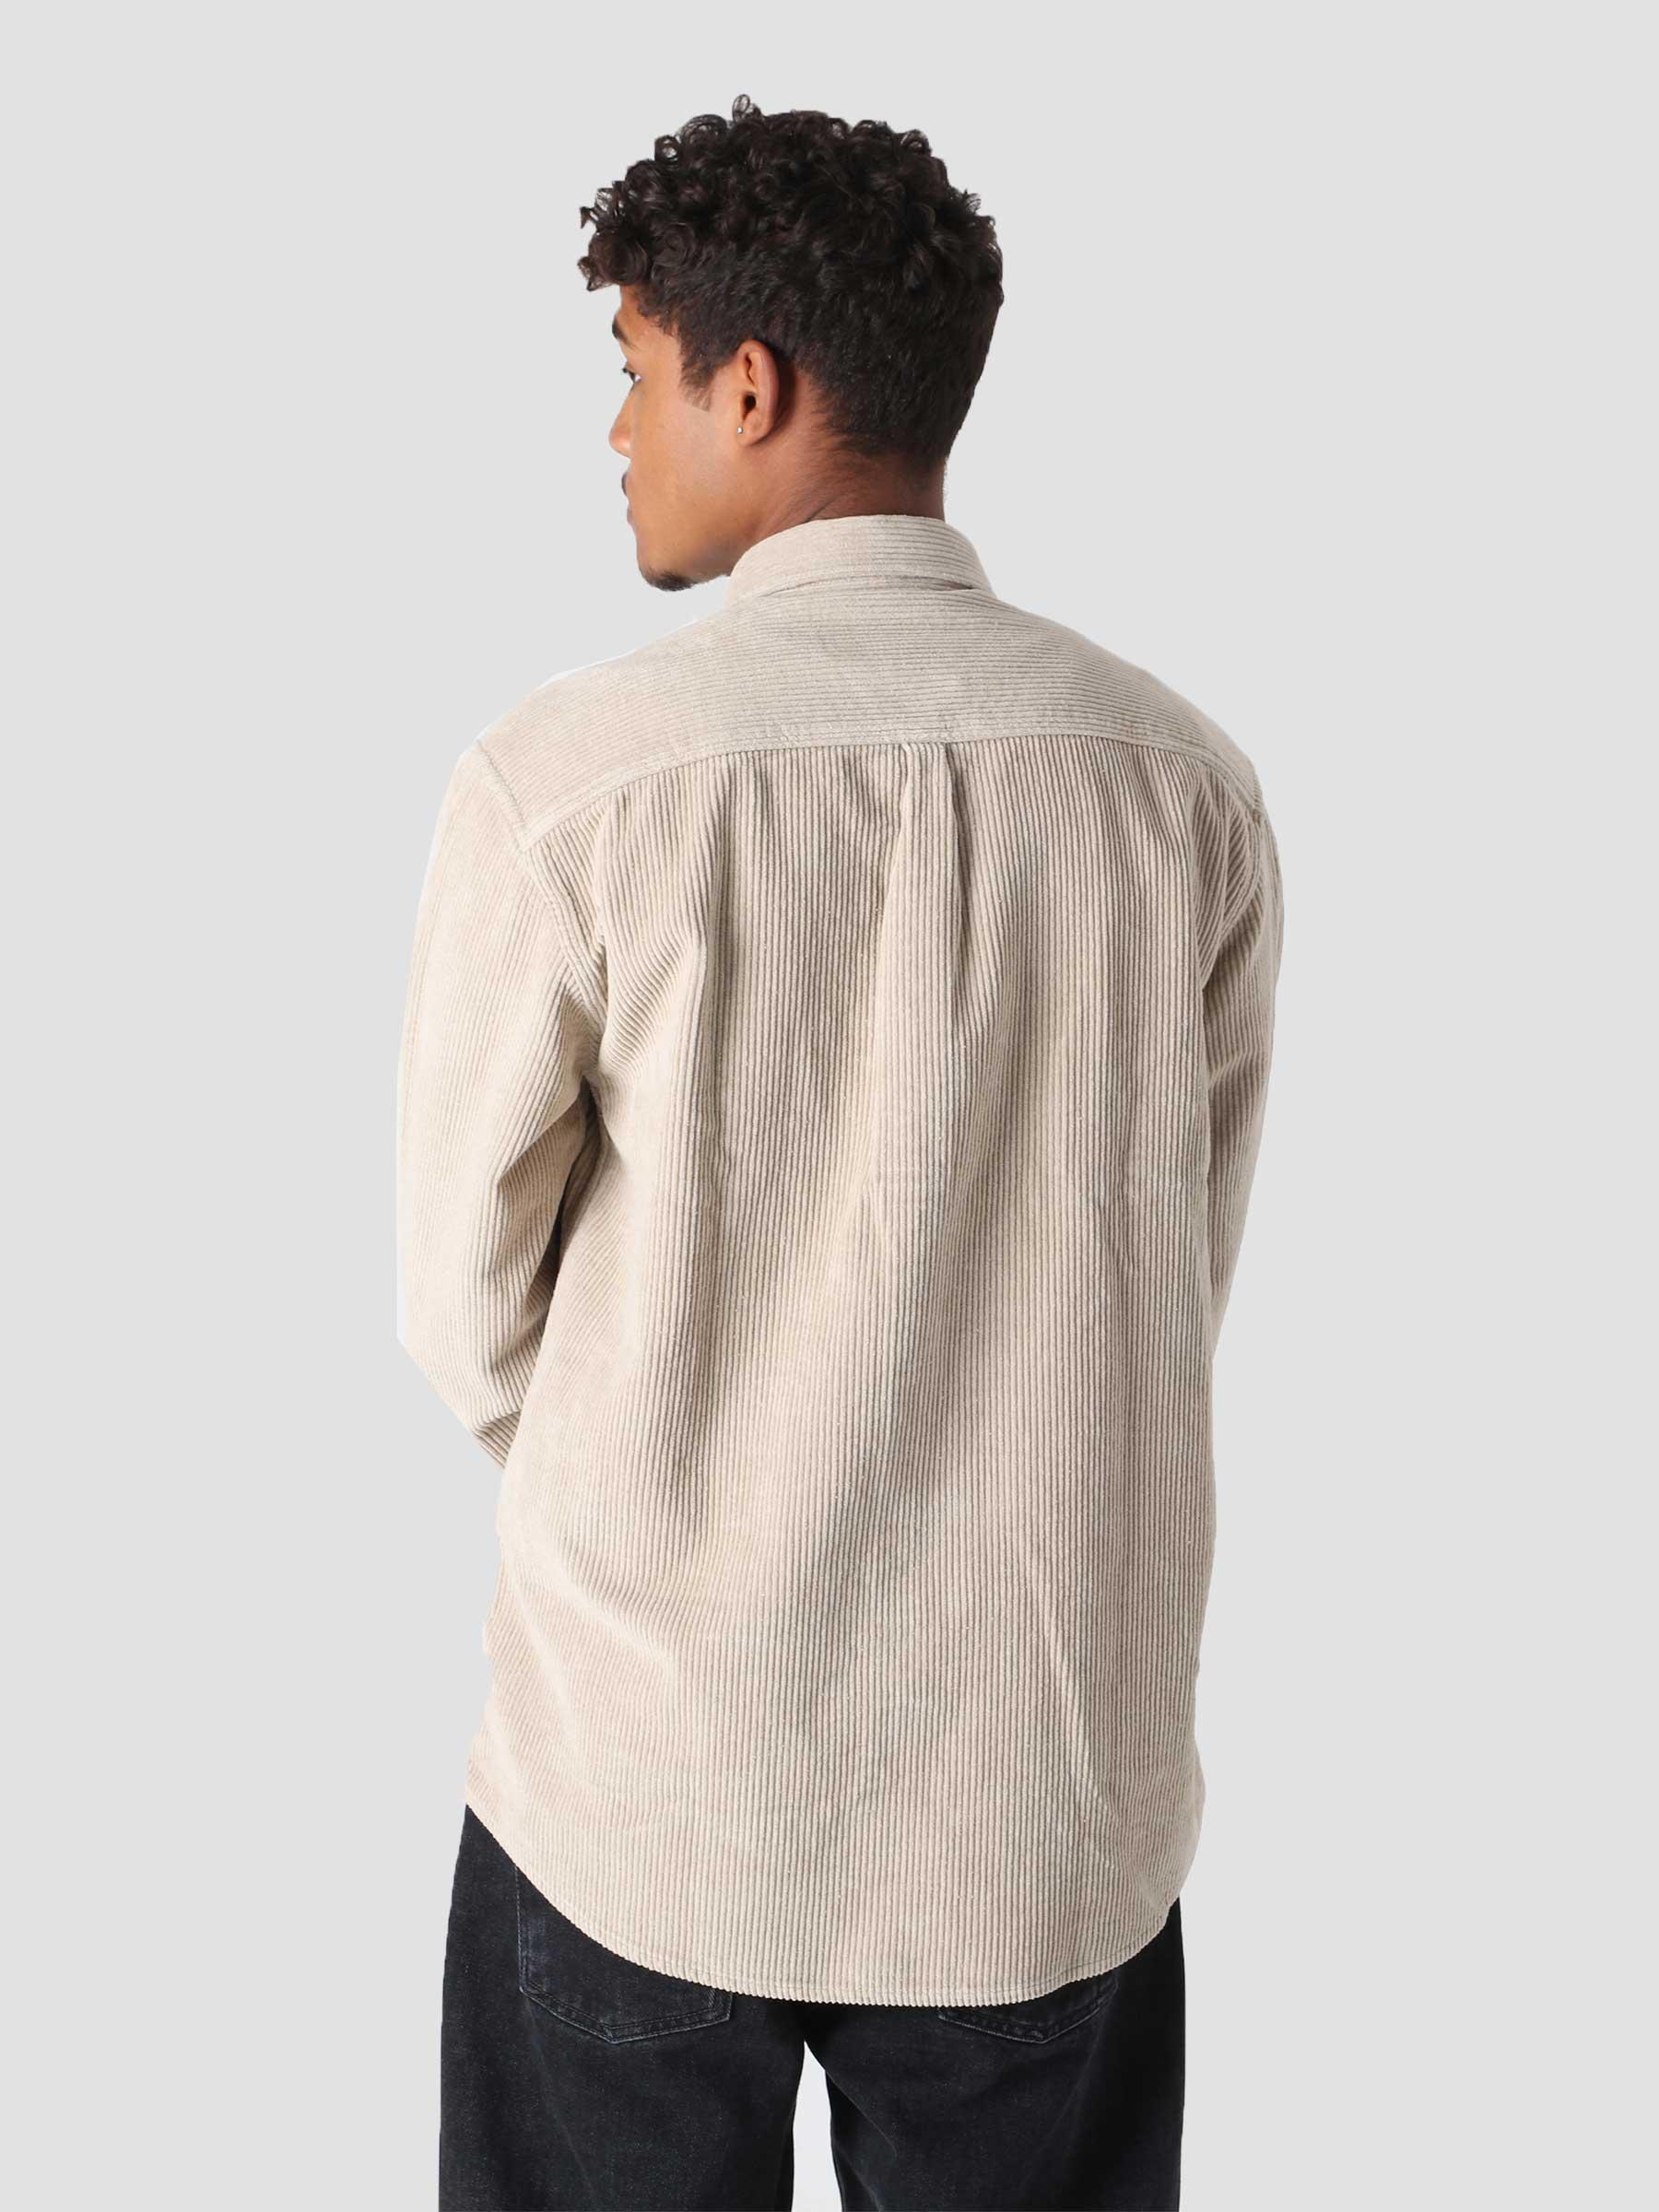 QB41 Cord Shirt Stone